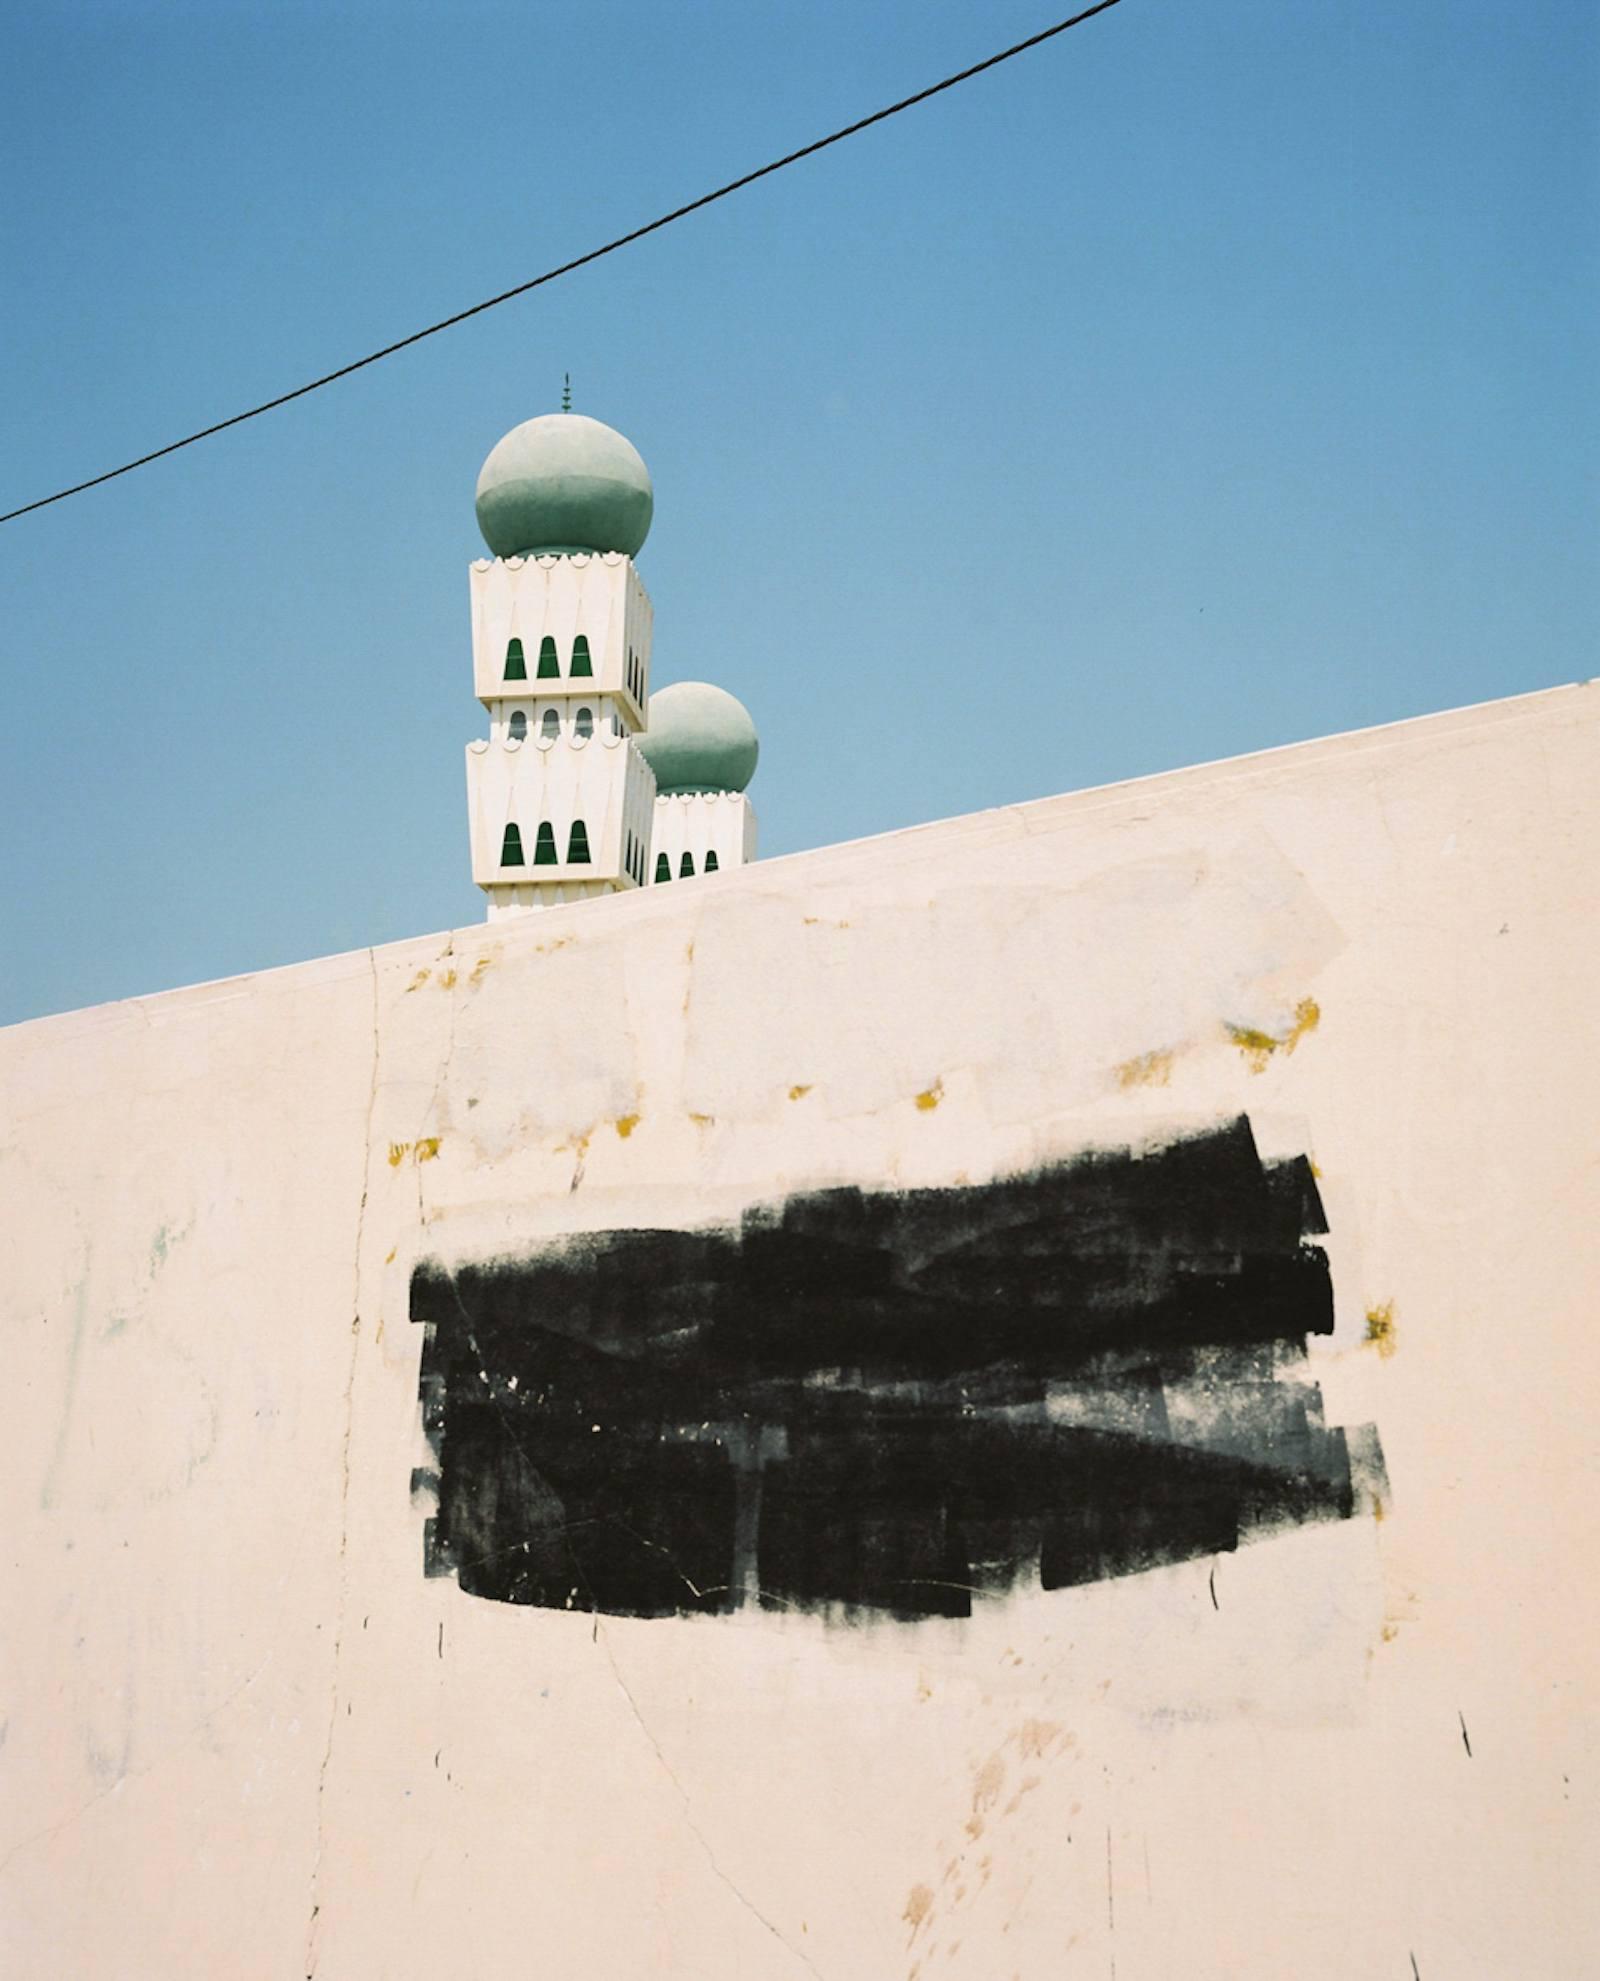 IGNANT-Photography-Dani-Pujalte-017